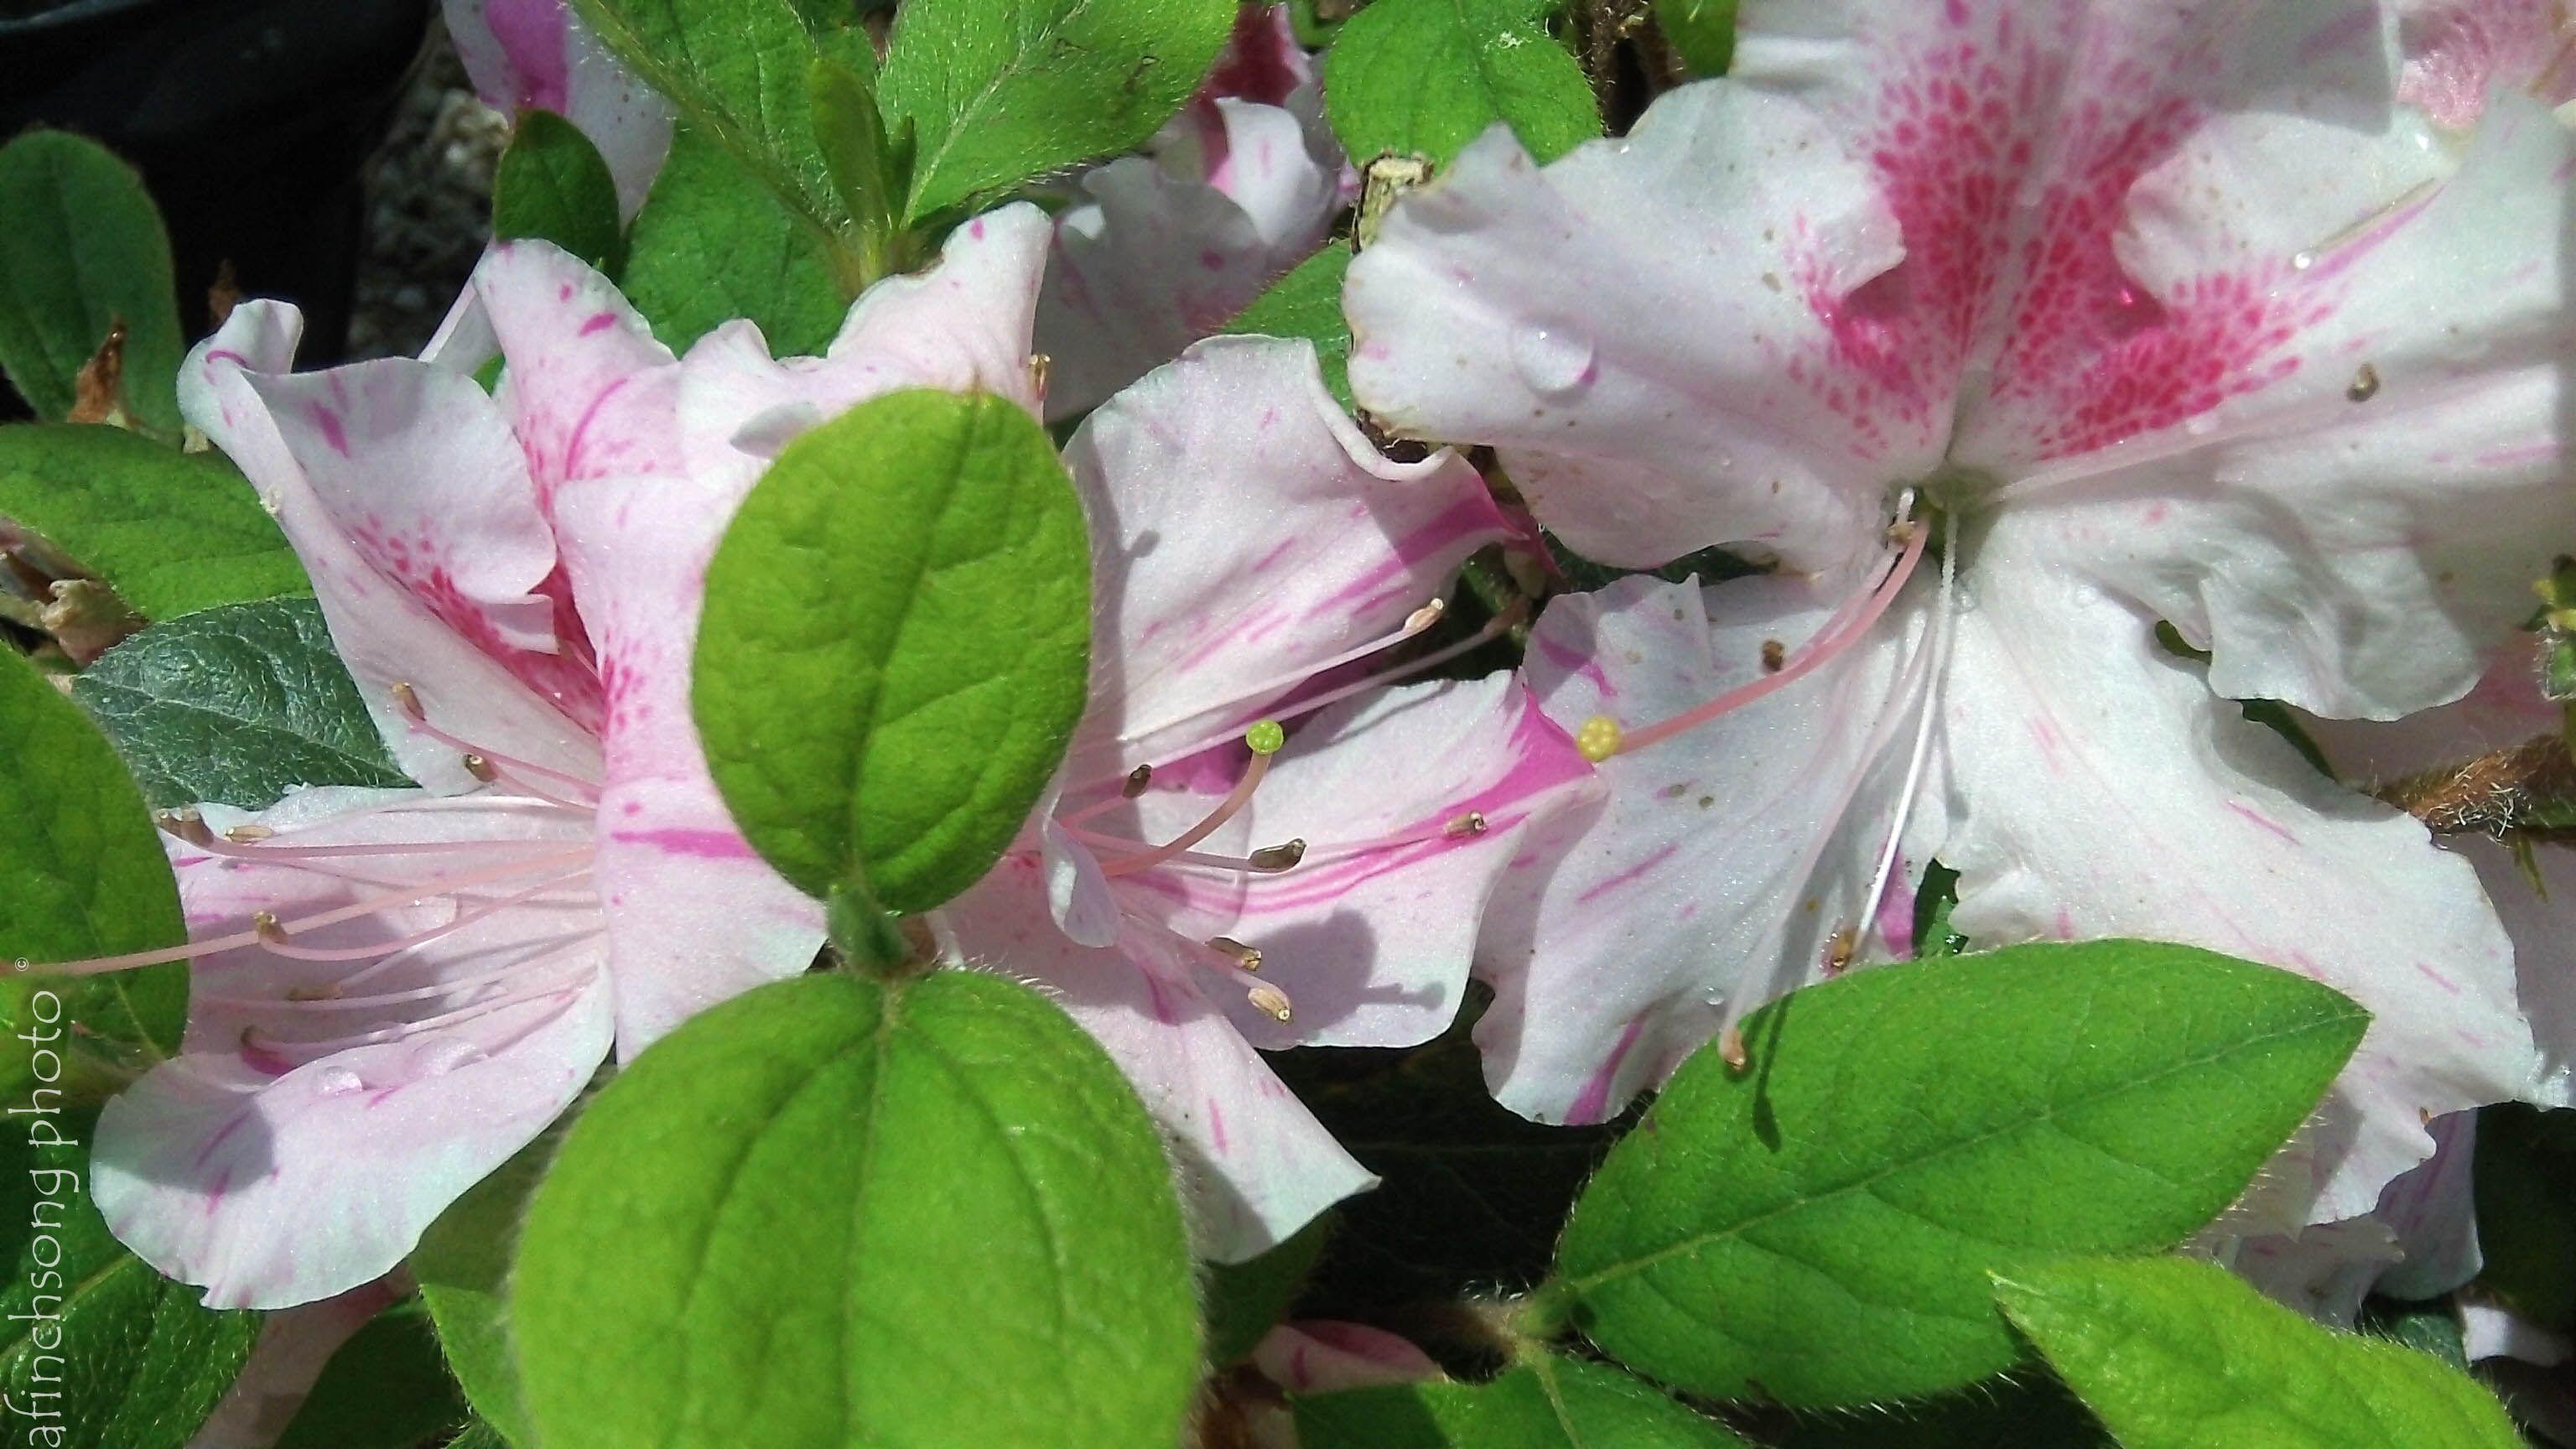 Azalea X Conlep Autumn Twist Encore Azalea Flowering Evergreen Part To Full Sun 10 Year Size 5 Hx4 W Upright Rounded Bloom Azalea Flower Azaleas Flowers